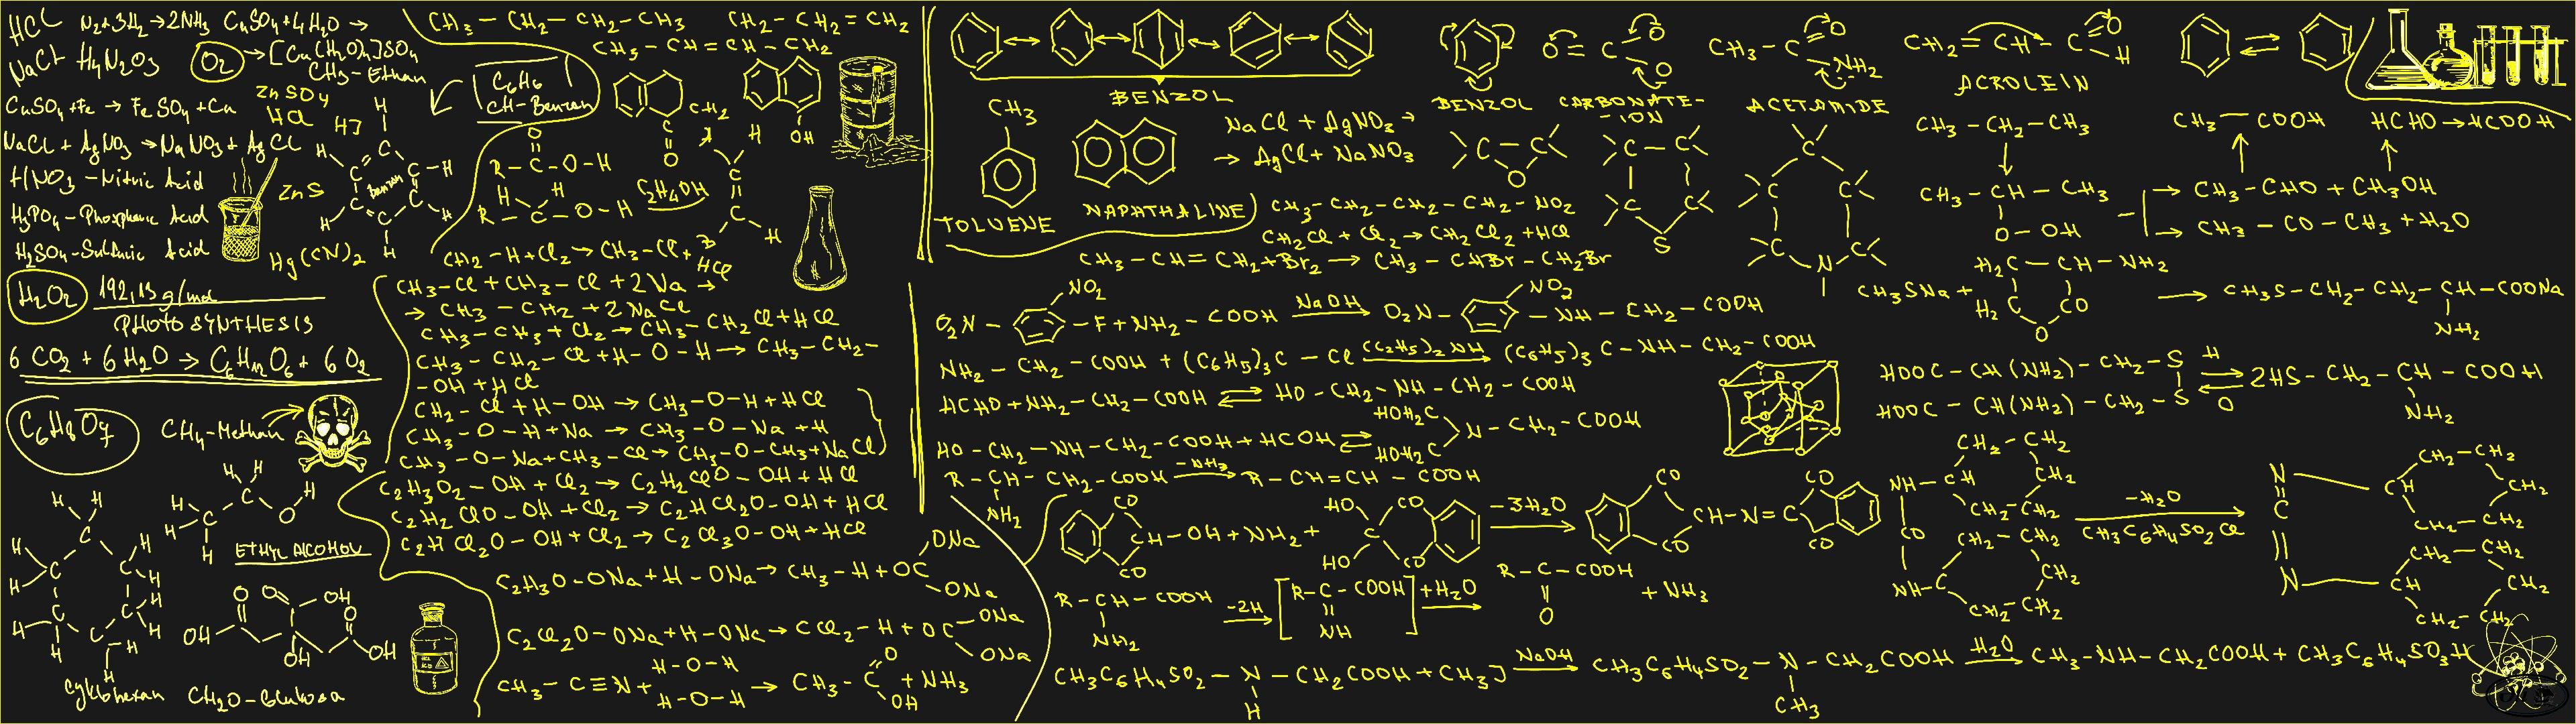 dual monitor screen chalk craie tableau board calcul equation A 3840x1080